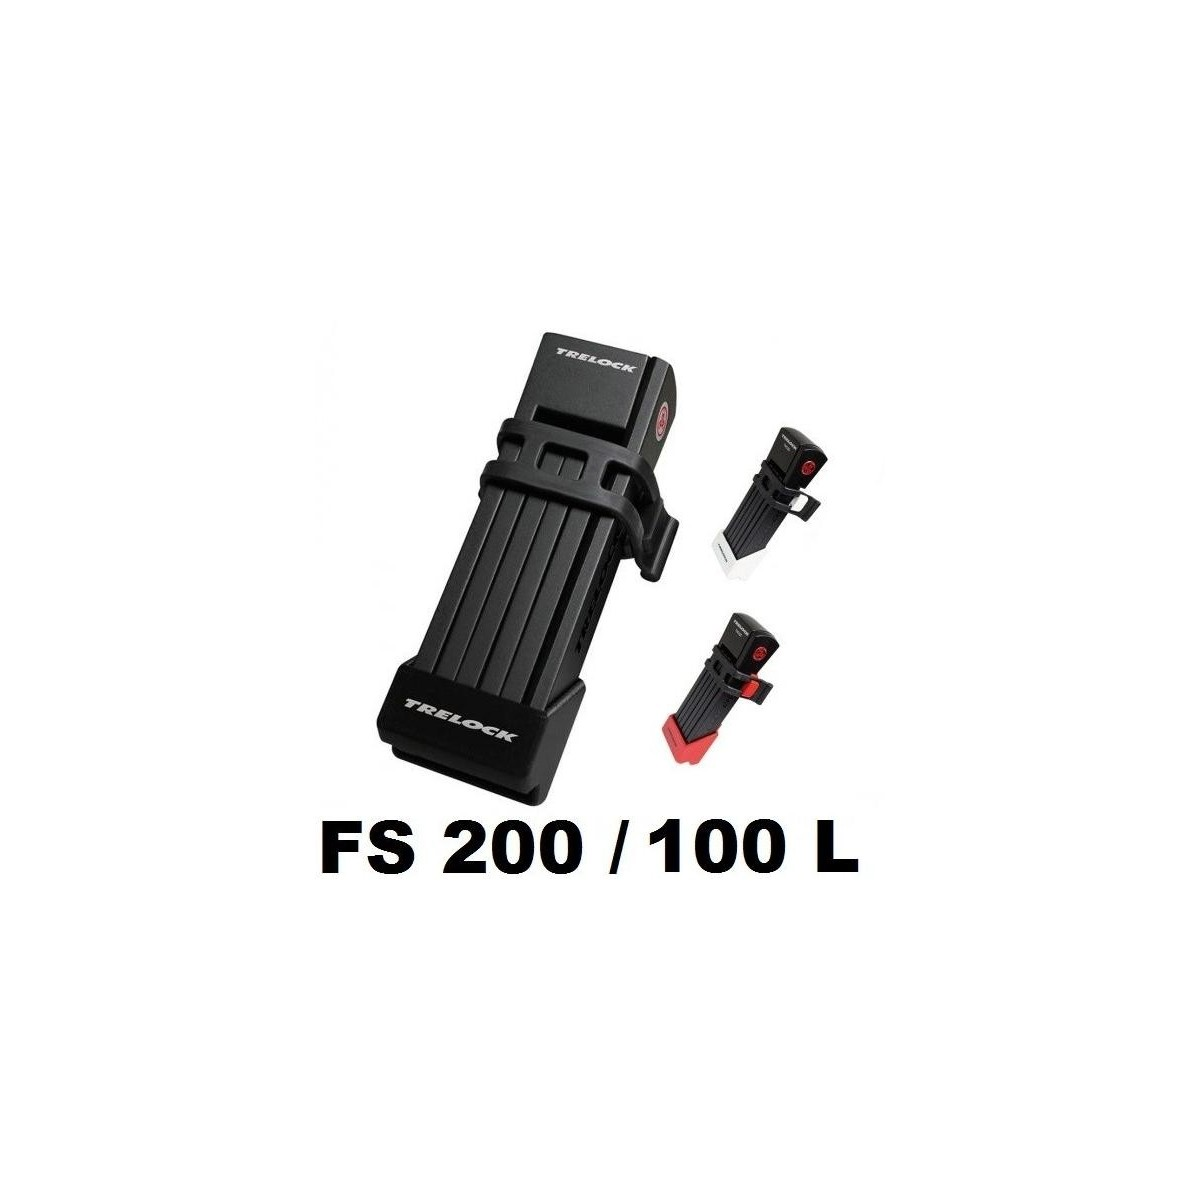 Trelock fs 200/100 plié